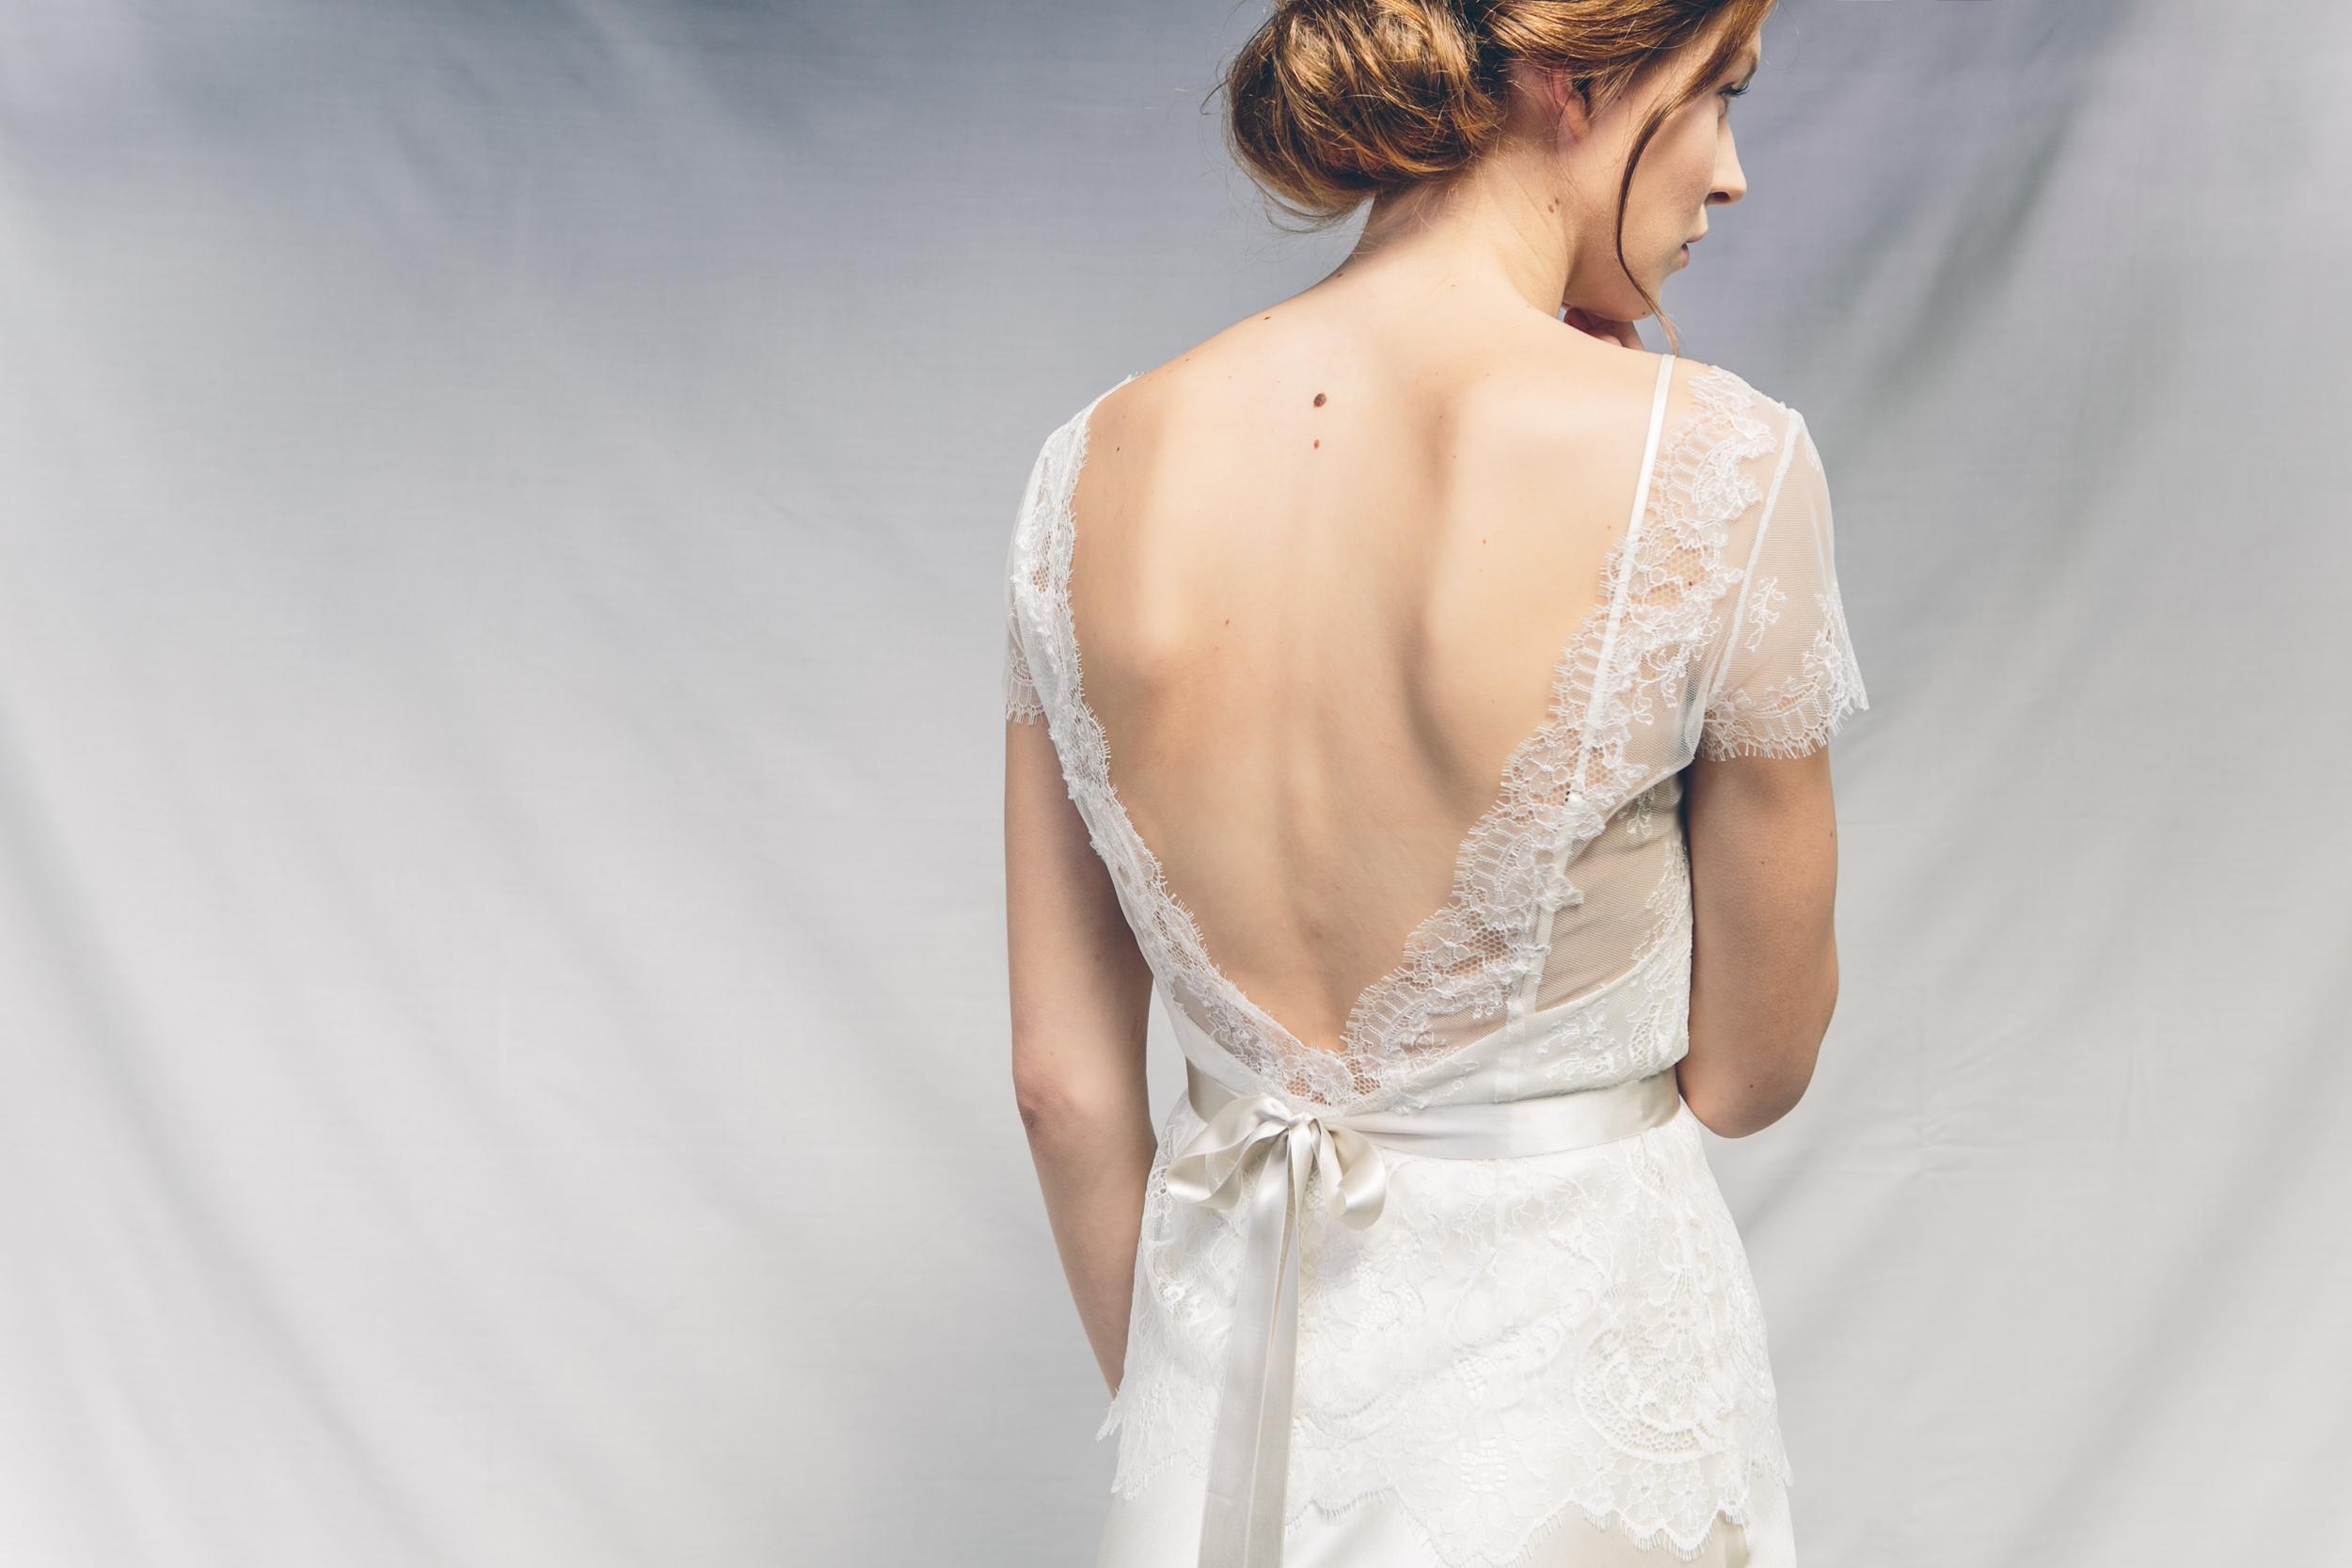 Kate-Beaumont-Wedding-Dresses-Sheffield-10.jpg